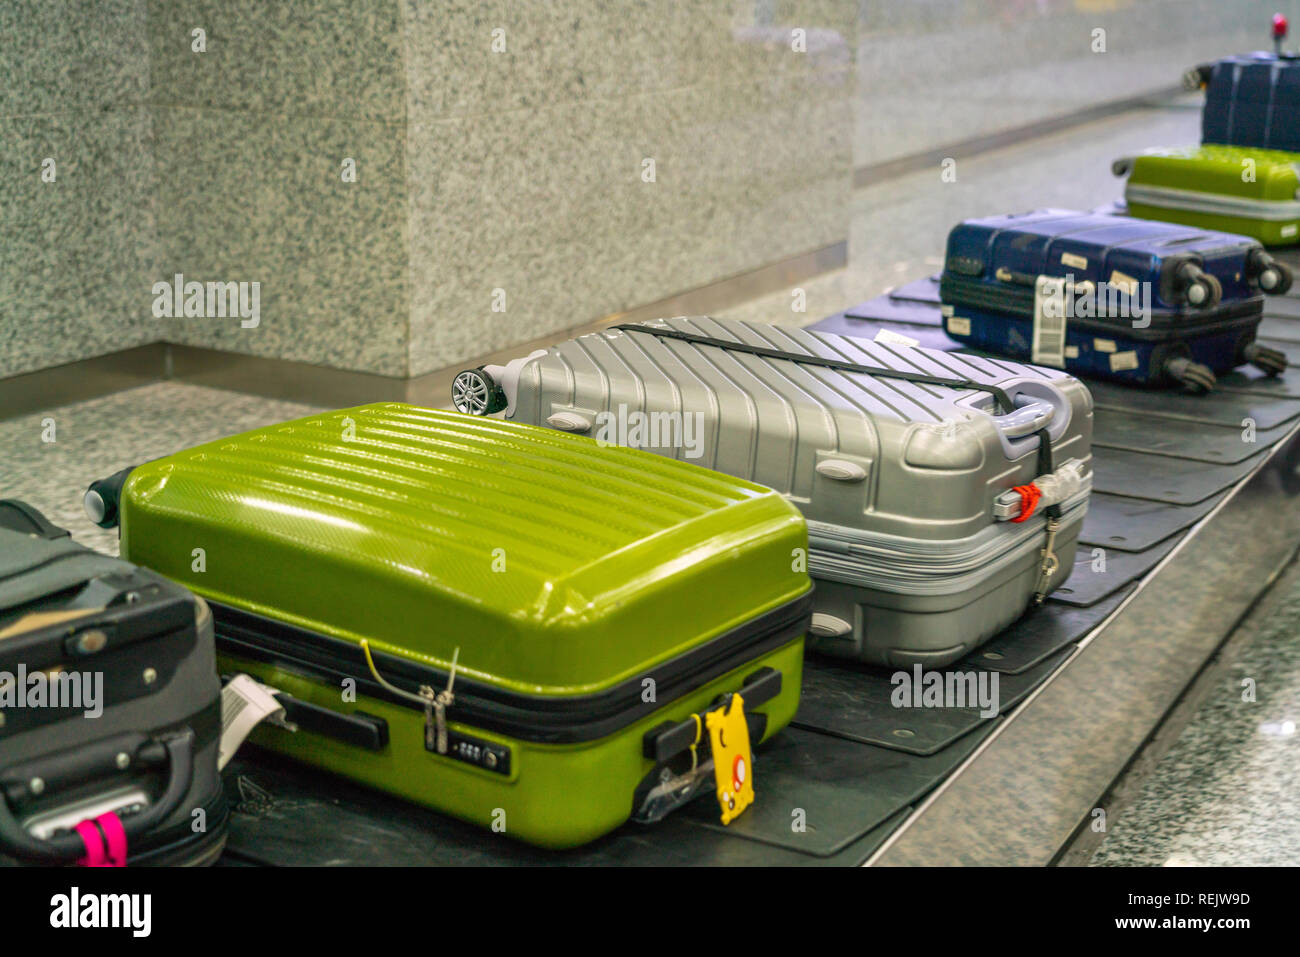 https www alamyimages fr valise et bagages sur le tapis roulant a l aeroport international image232754969 html